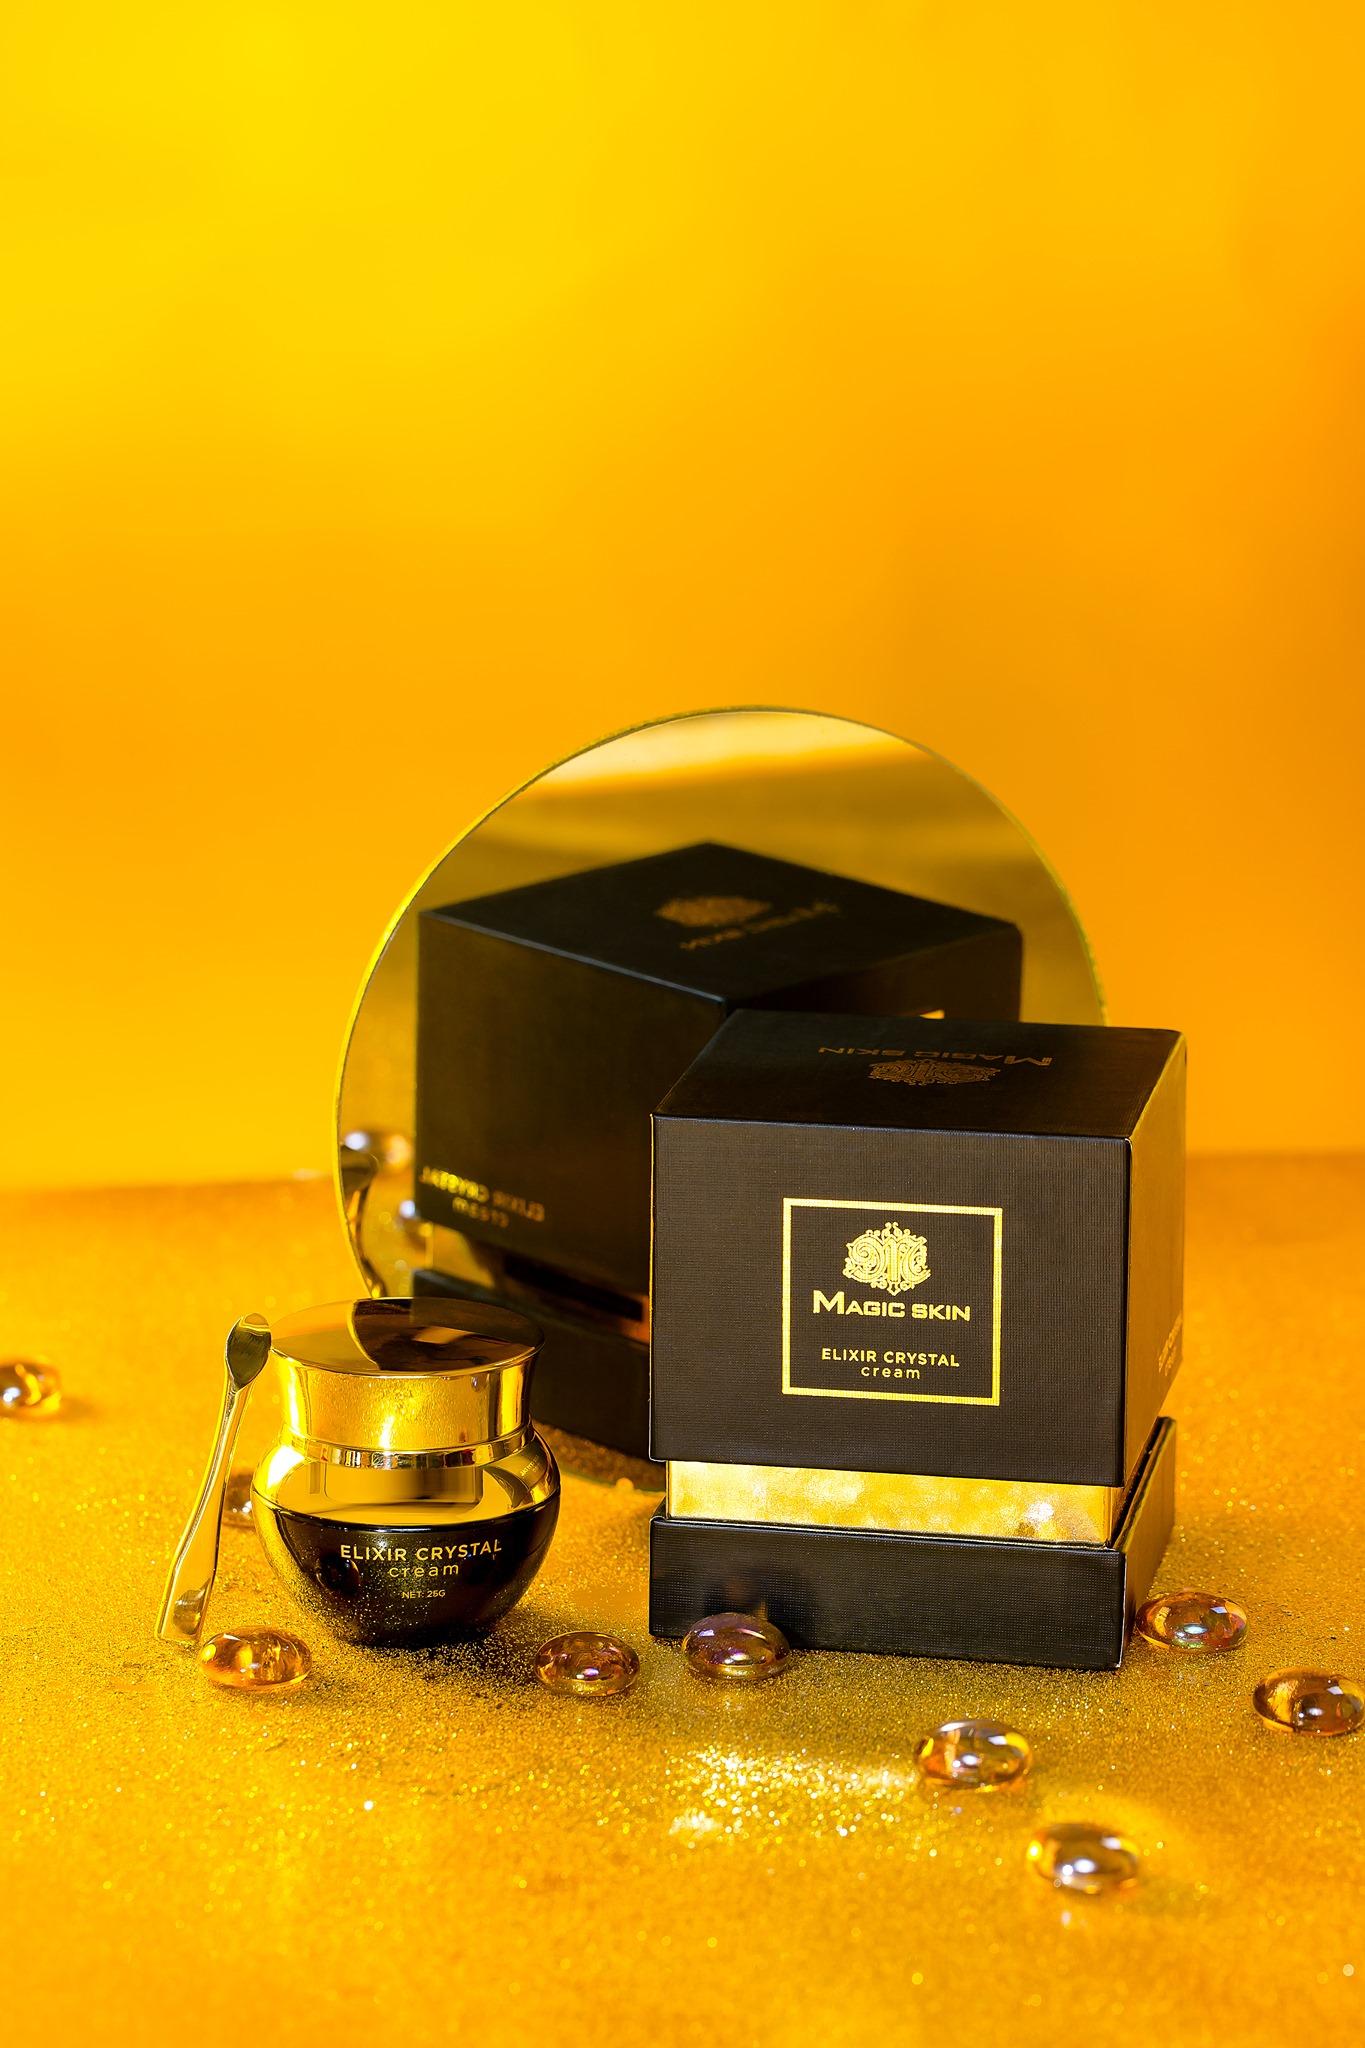 Kem ngọc trai đen Magic Skin - Elixir Crystal Cream